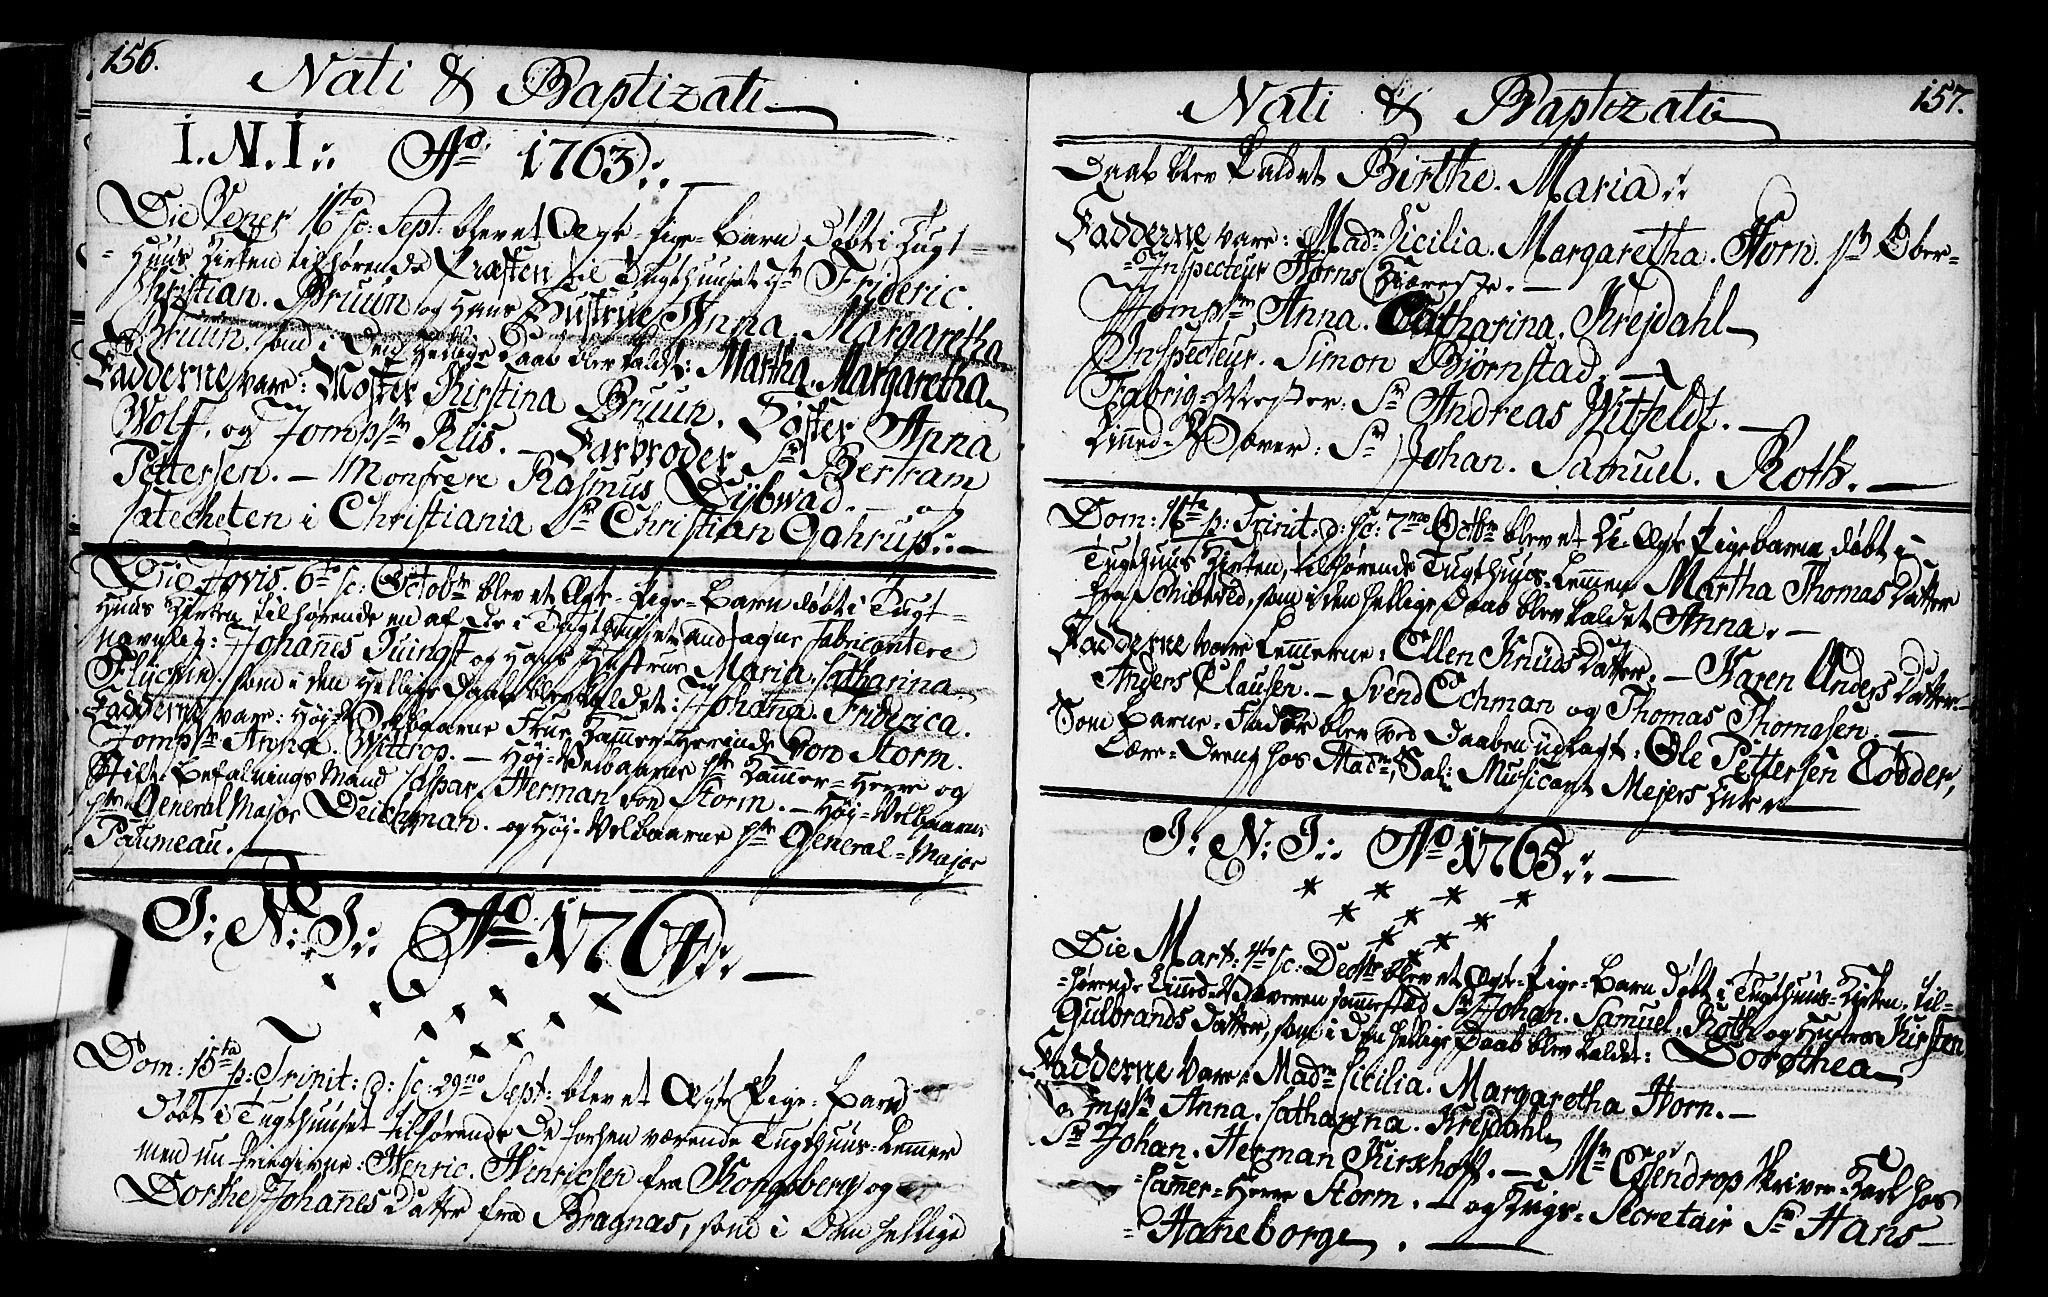 SAO, Kristiania tukthusprest Kirkebøker, F/Fa/L0001: Ministerialbok nr. 1, 1758-1828, s. 156-157